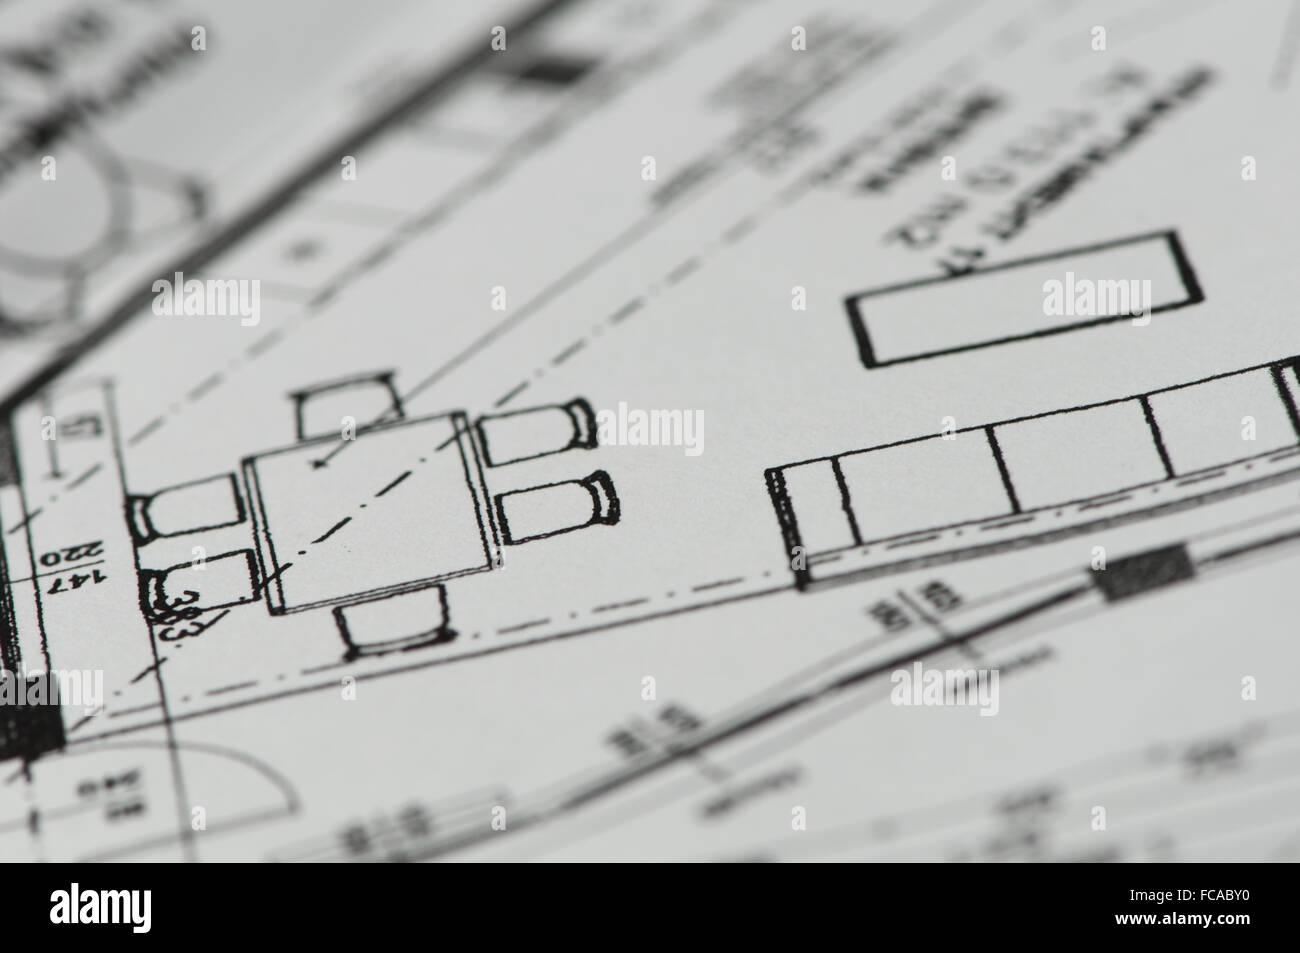 Vector blueprint - Stock Image